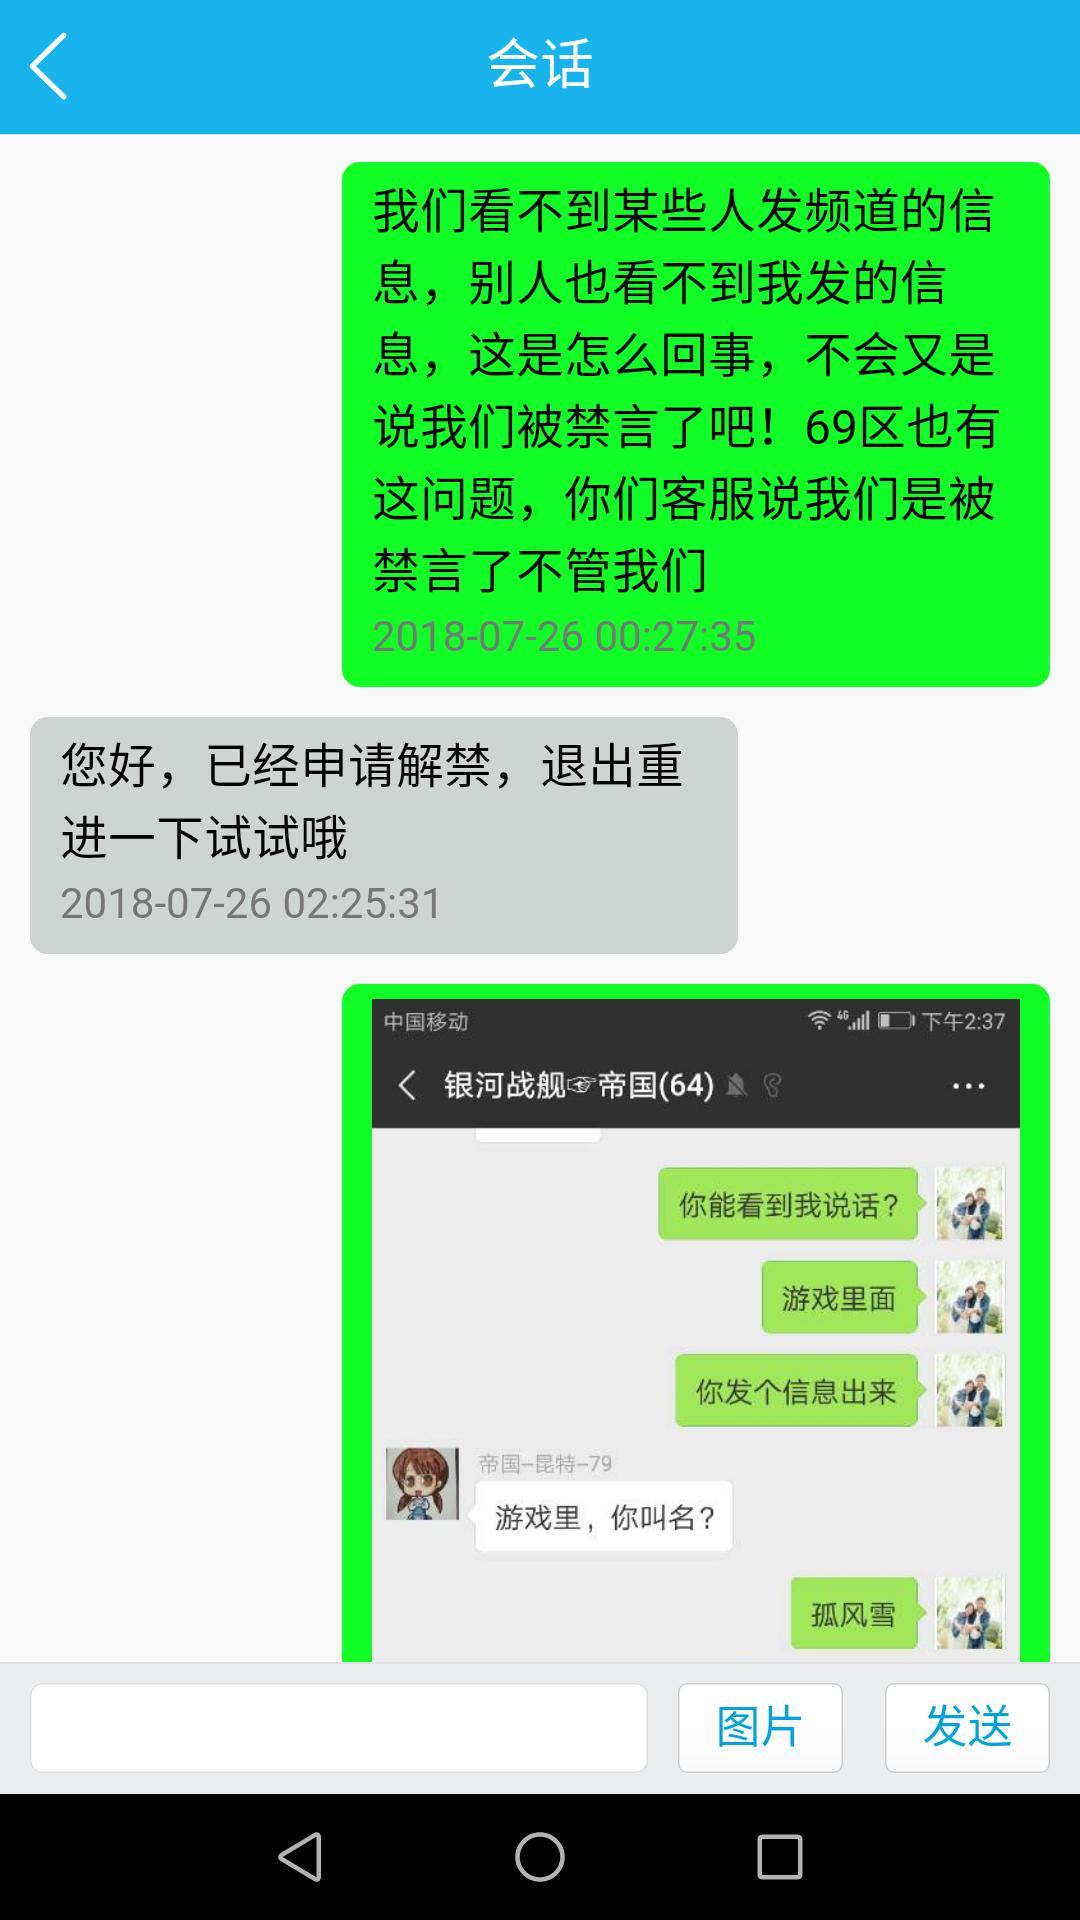 Screenshot_20180726-144026.png